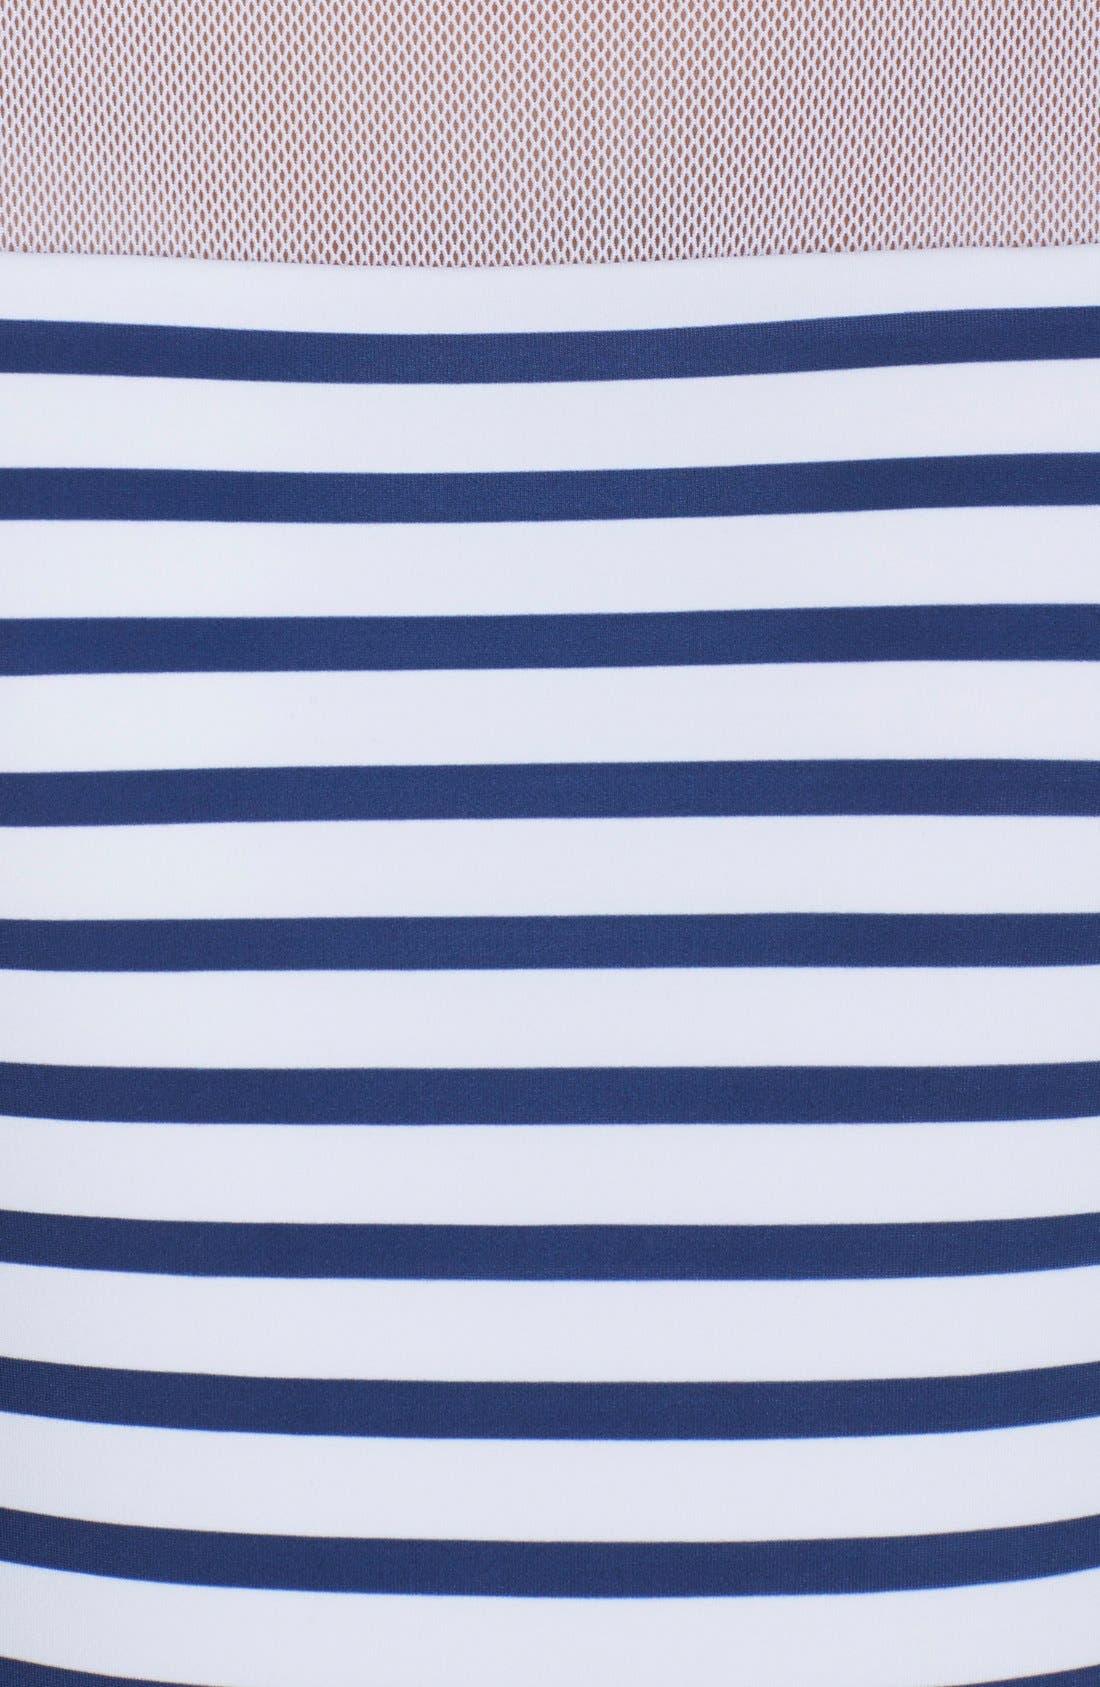 Alternate Image 3  - Blue Life 'Portofino' One-Piece Swimsuit